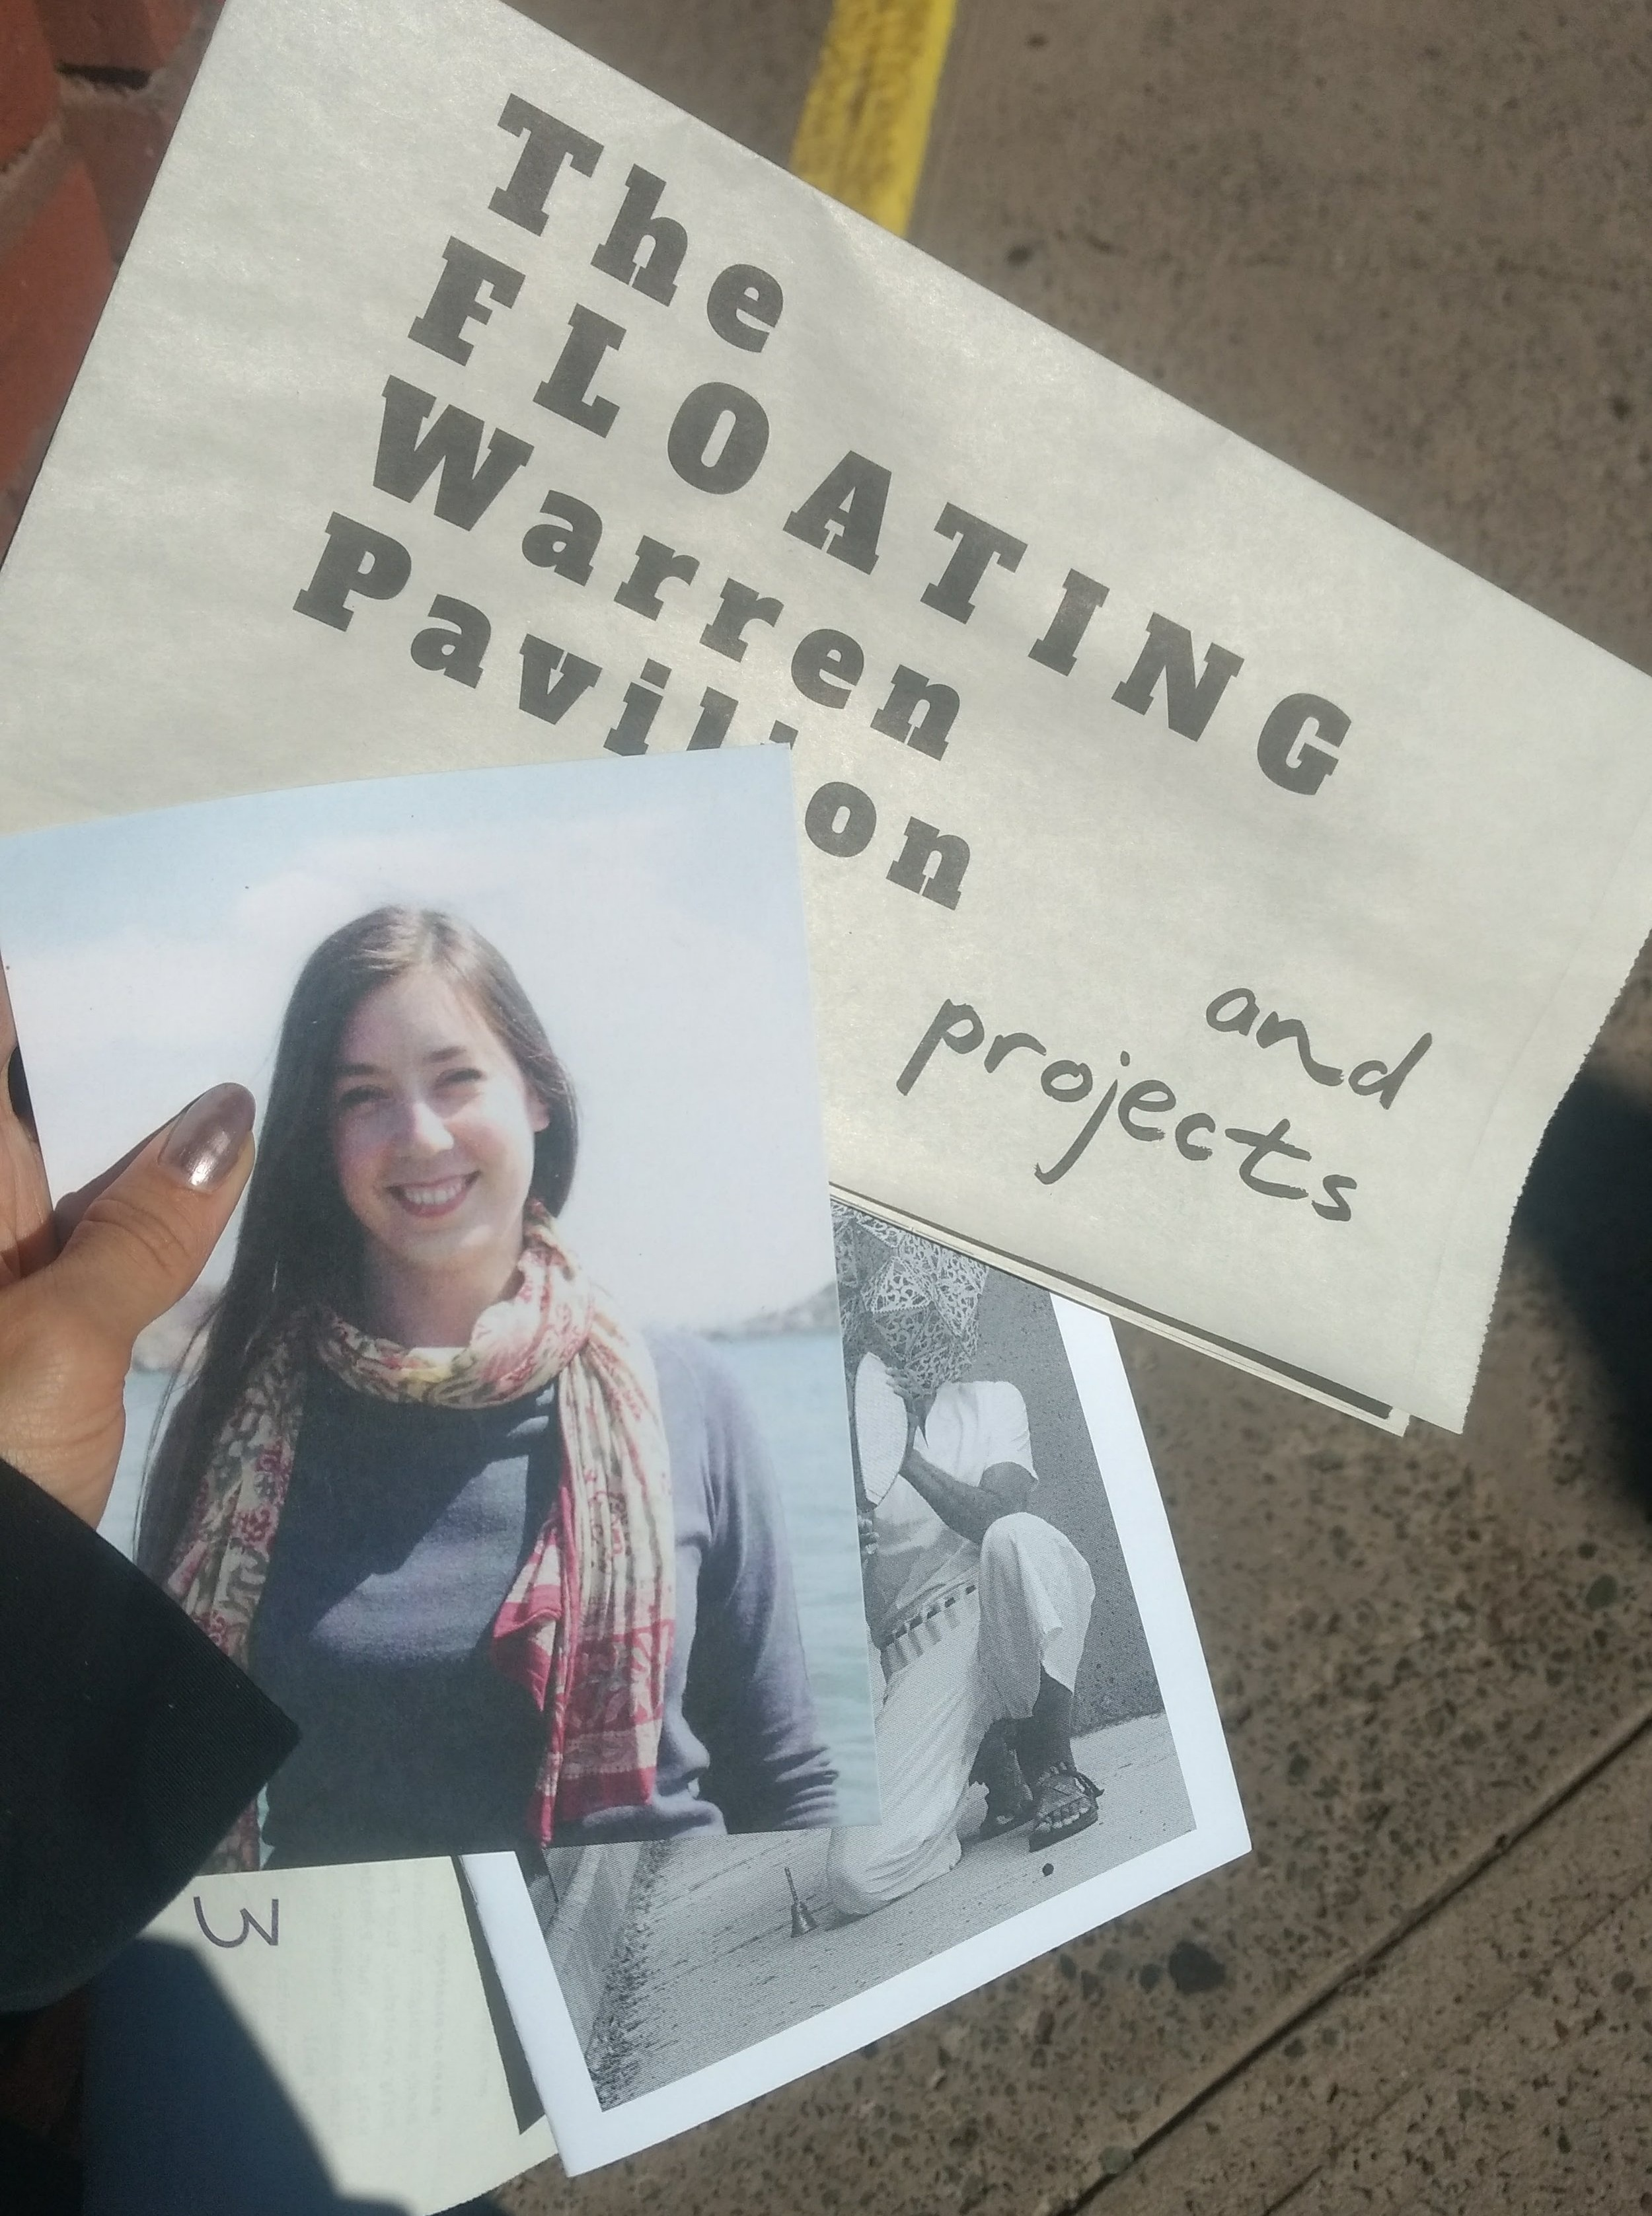 Printed matter distributed at Flotilla included a dedication to Mary's legacy. Photo: Amanda Shore